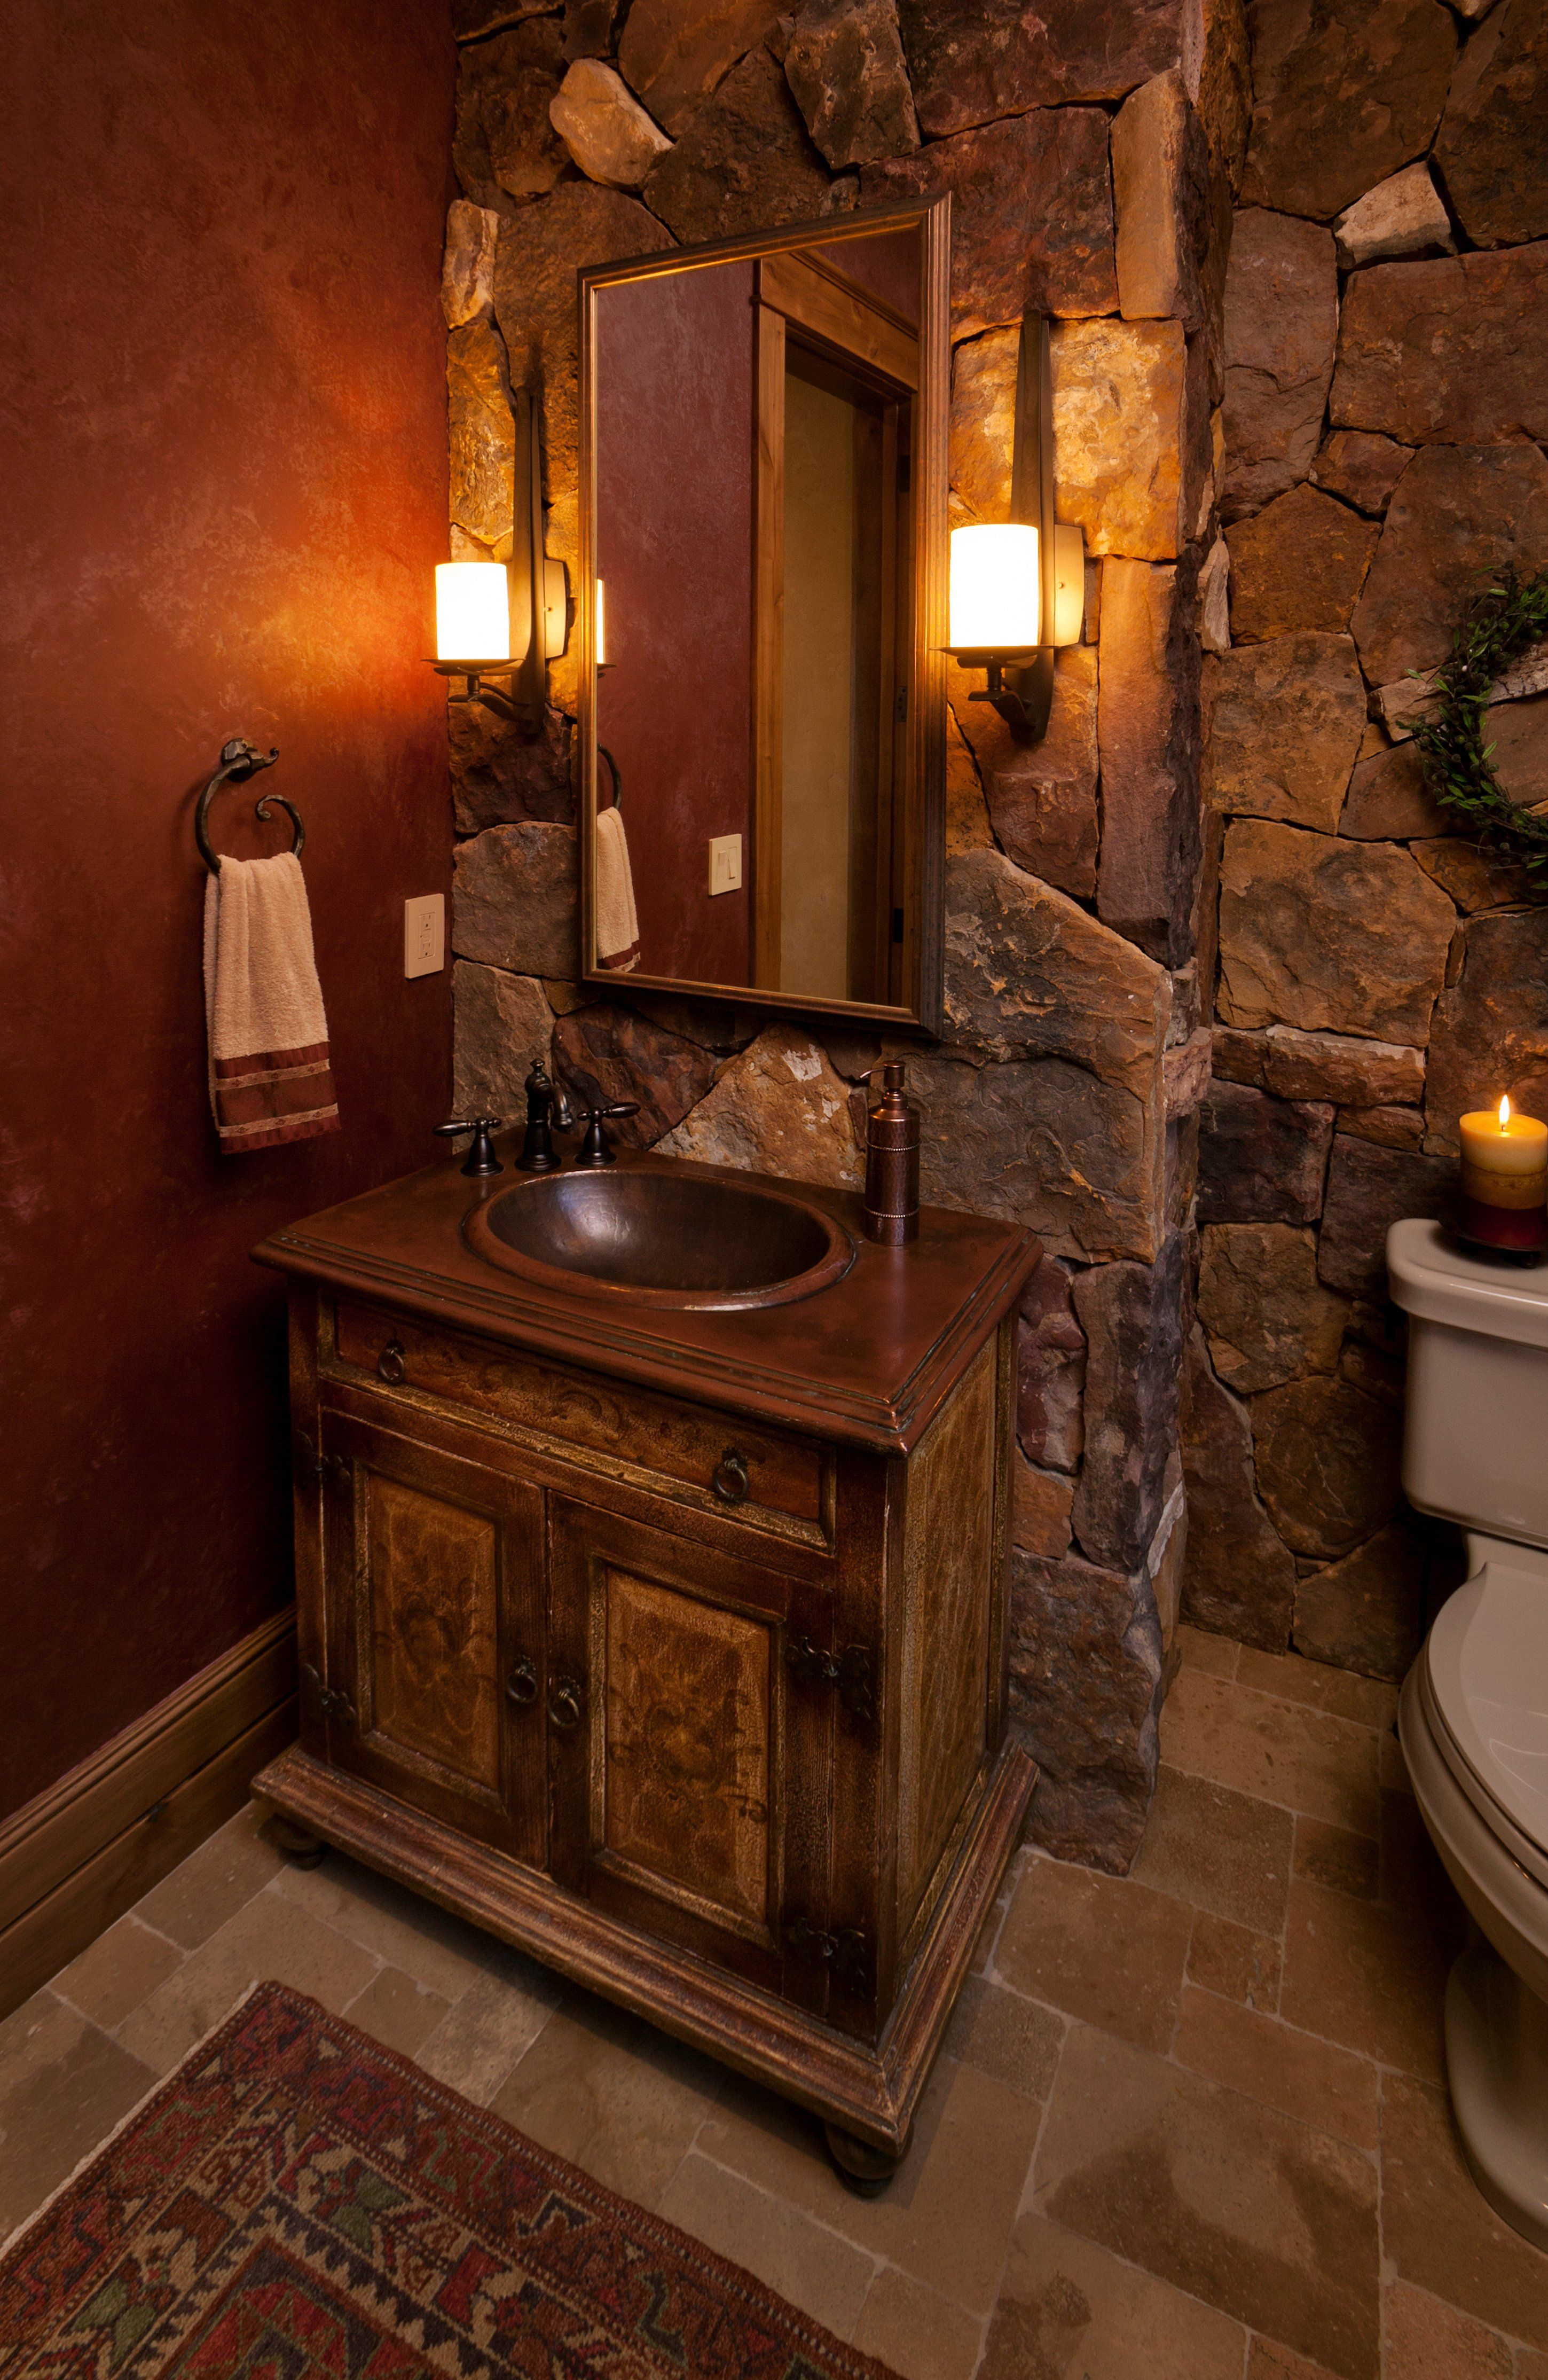 cabinbathroomvanityideas   small bath ideas